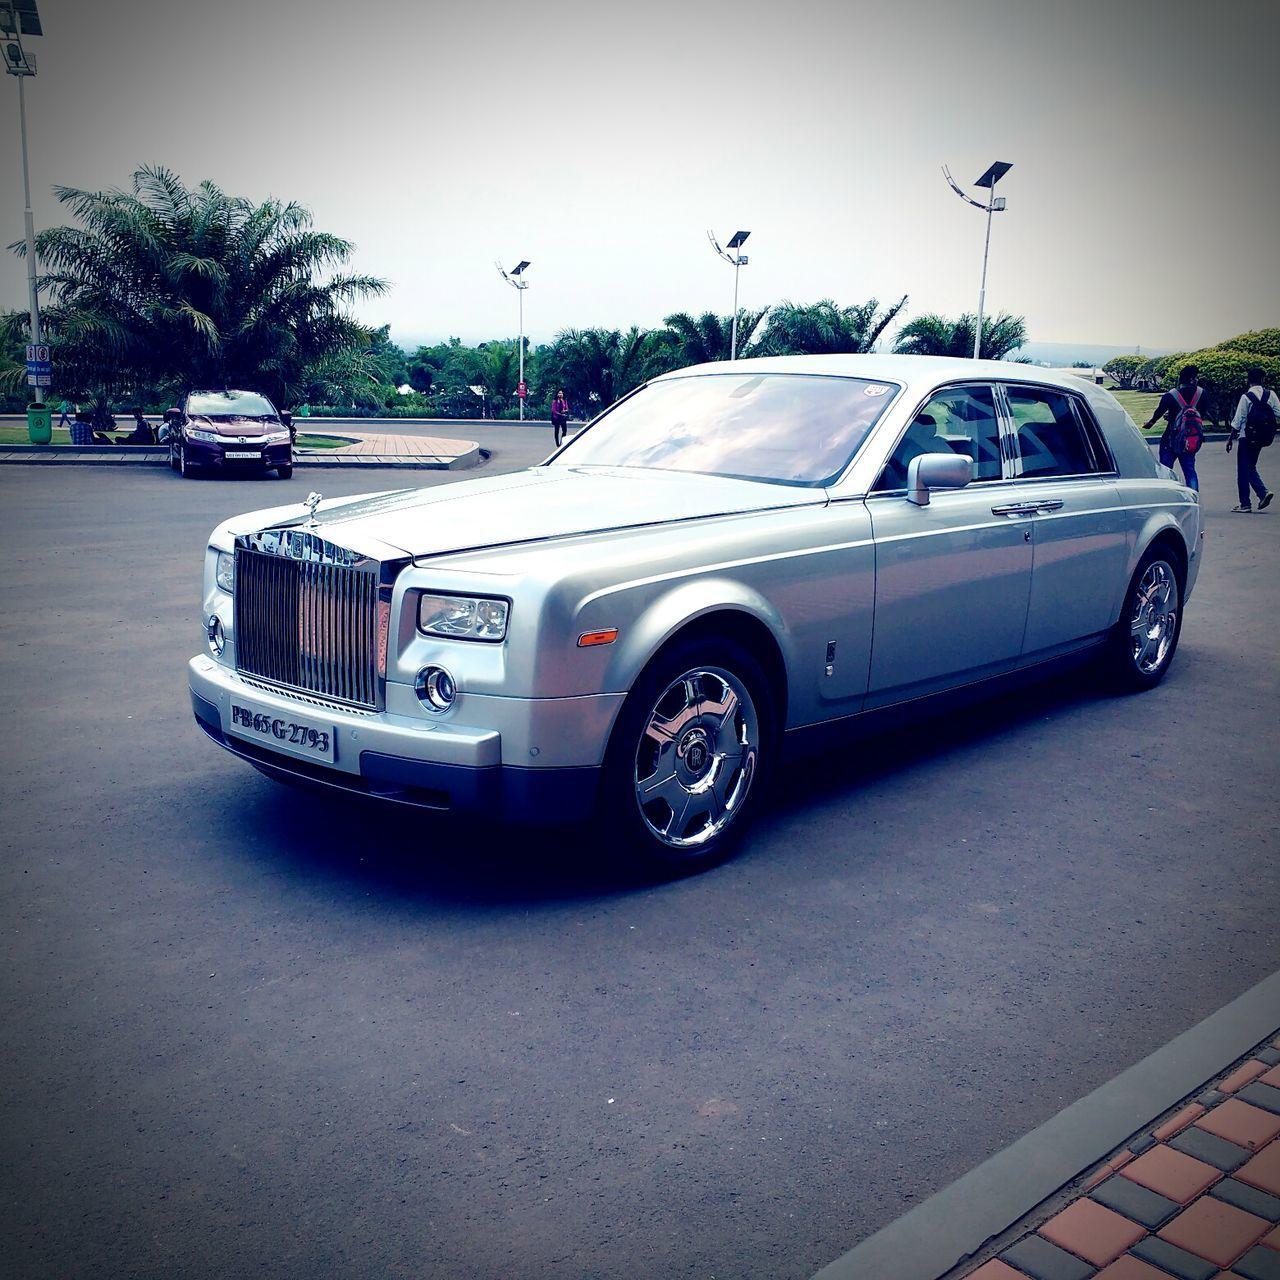 Rolls royce Car Outdoors Luxury Palace On Wheels Speedometer